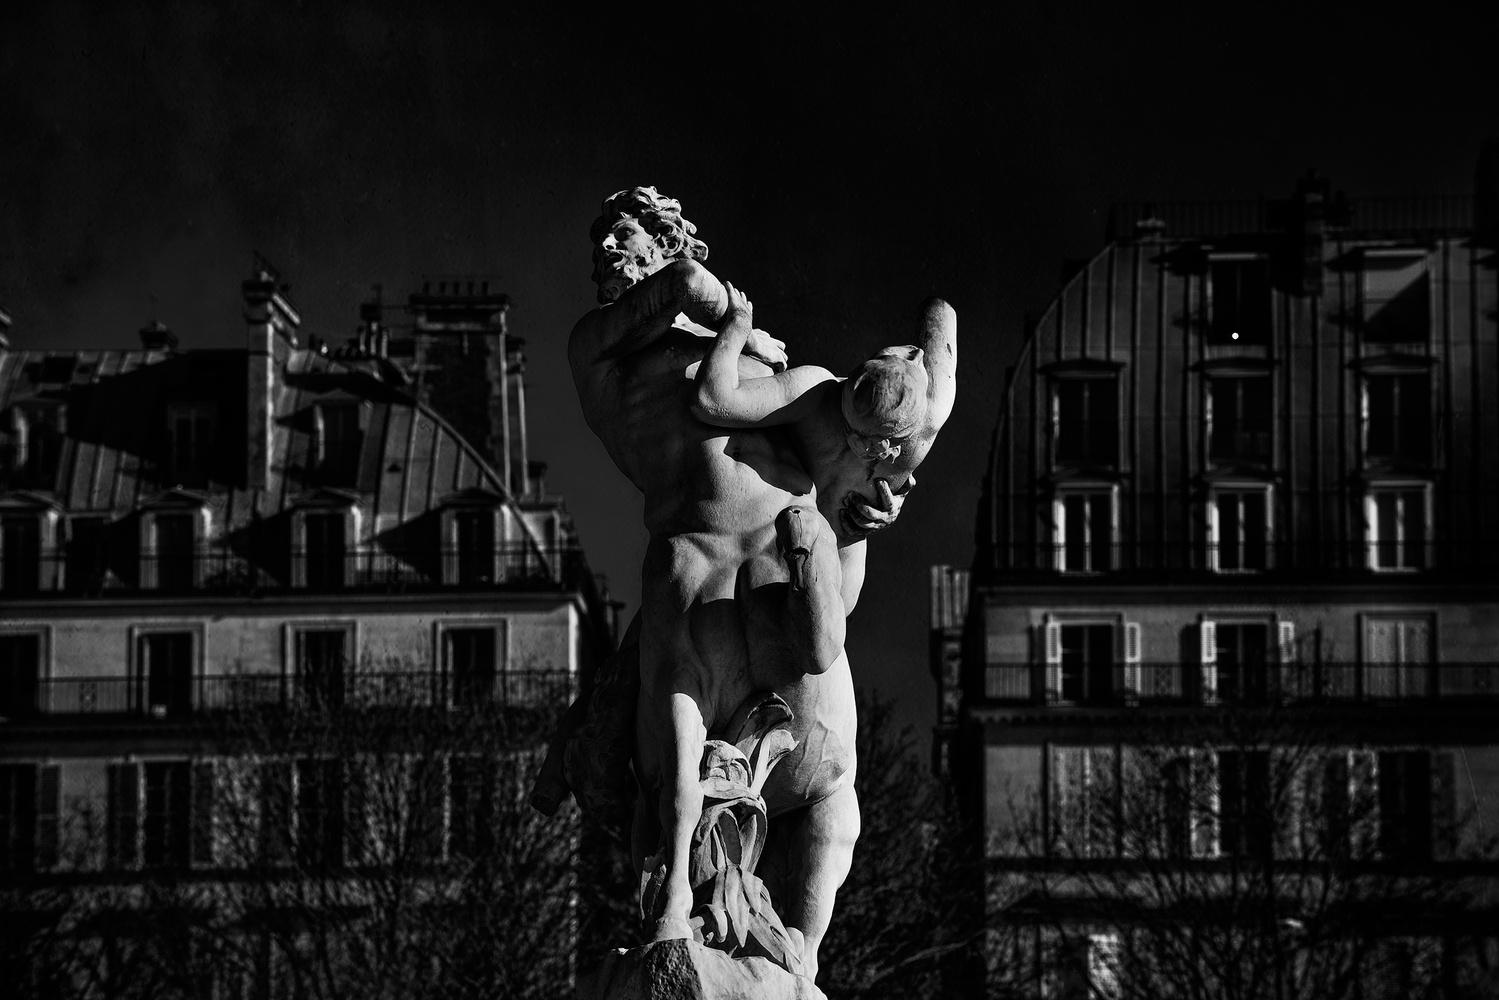 Centaur capturing Nymph by Marqueste by Darcy Brown